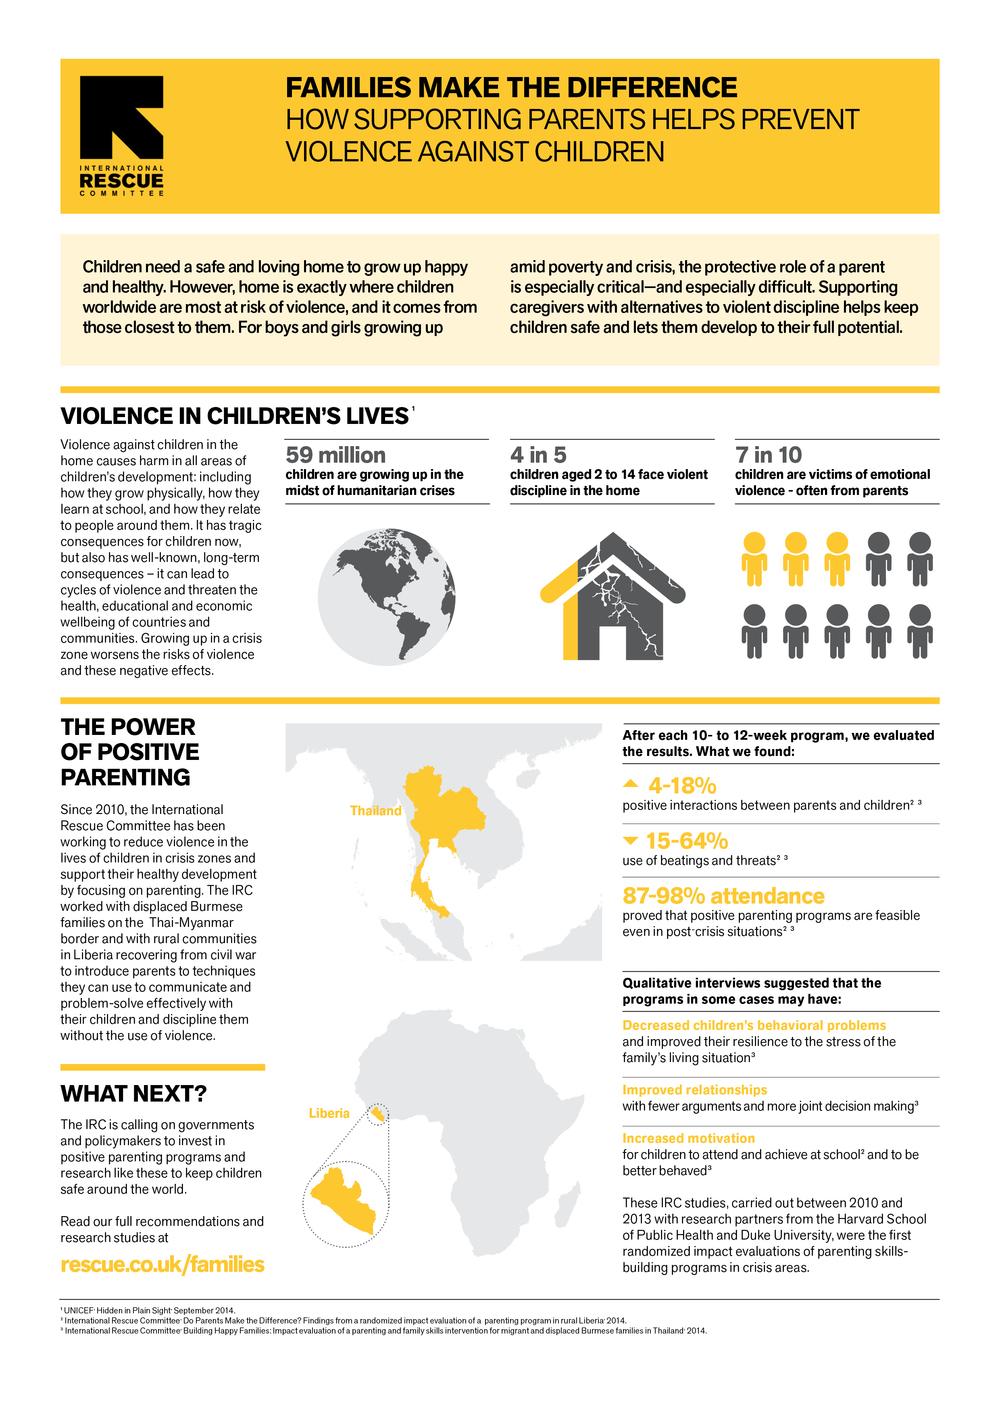 IRC_infographic_211114.jpg